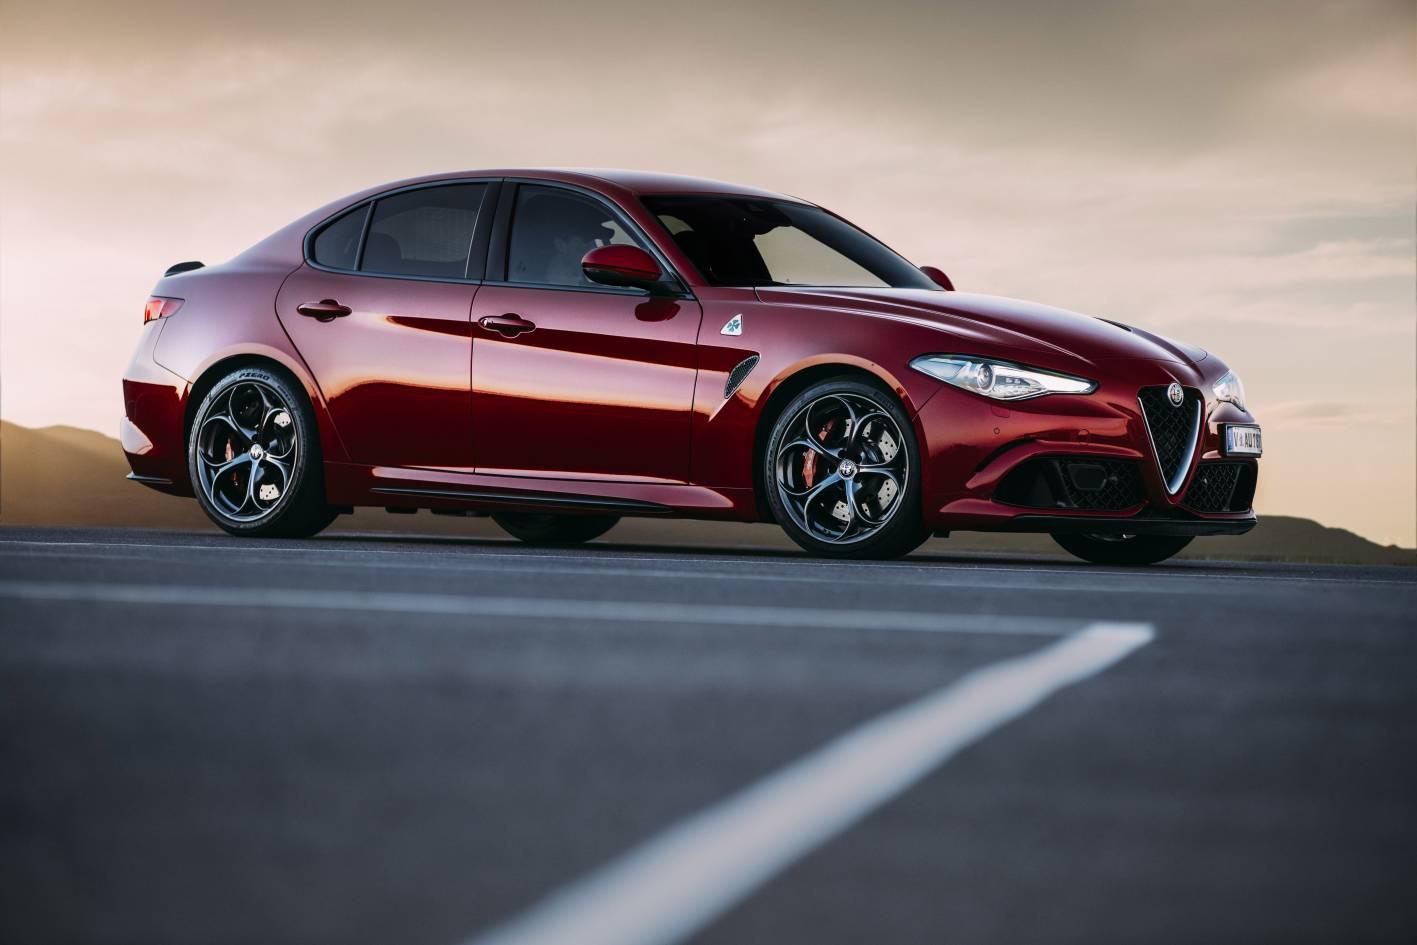 Toyota Of Alvin >> Alfa Romeo Giulia takes on midsize premium segment from $59,895 - ForceGT.com